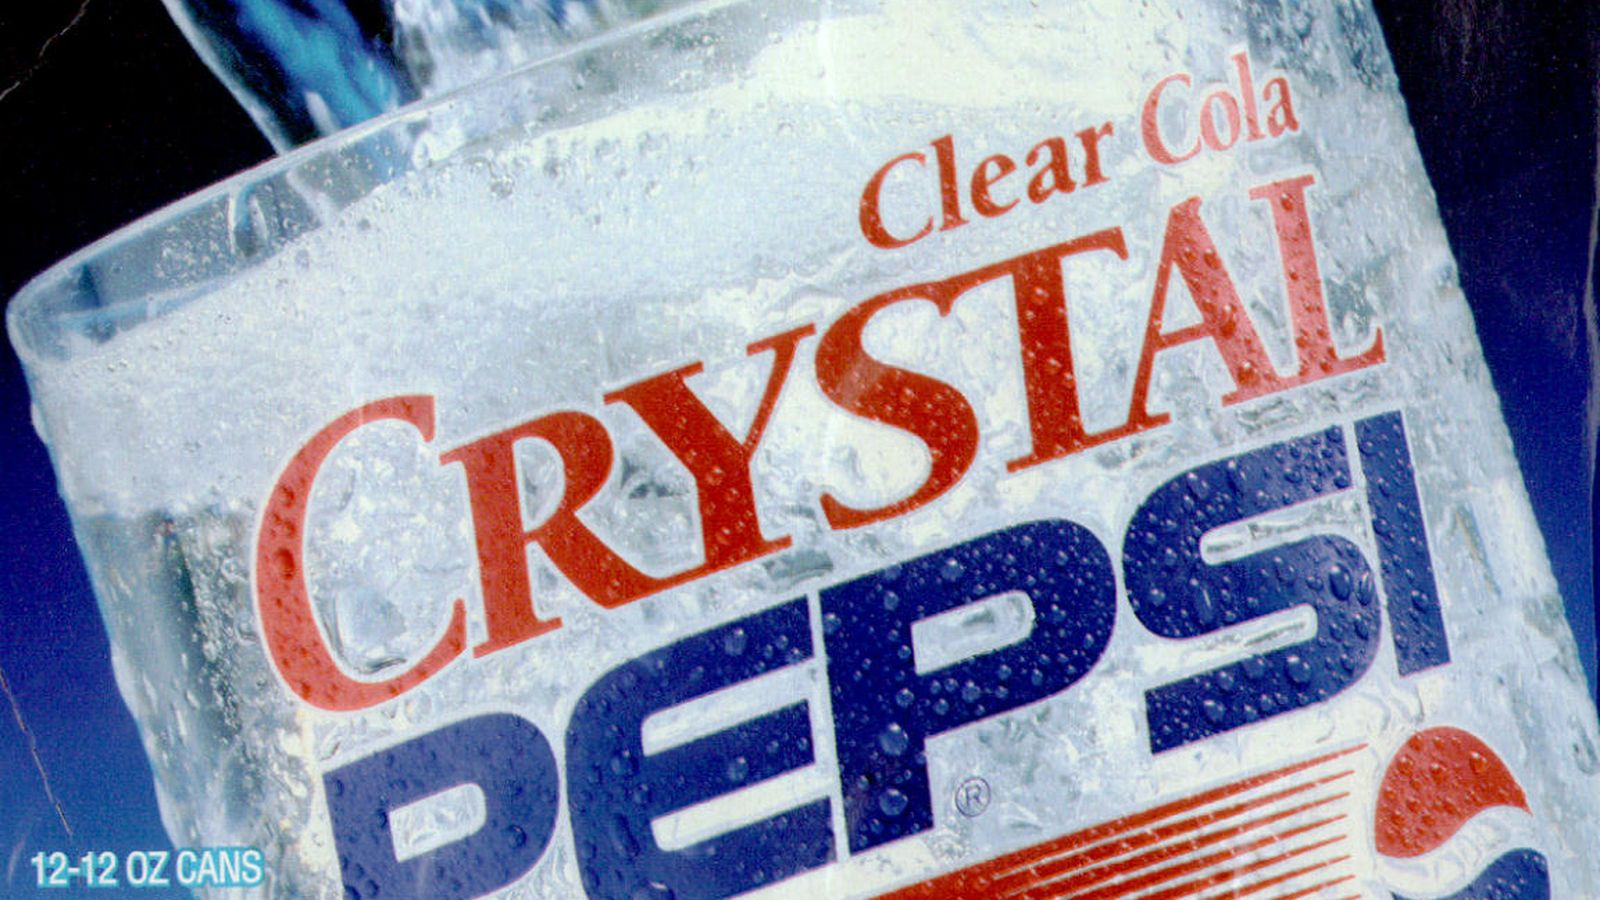 Crystal_Pepsi crystal pepsi know your meme